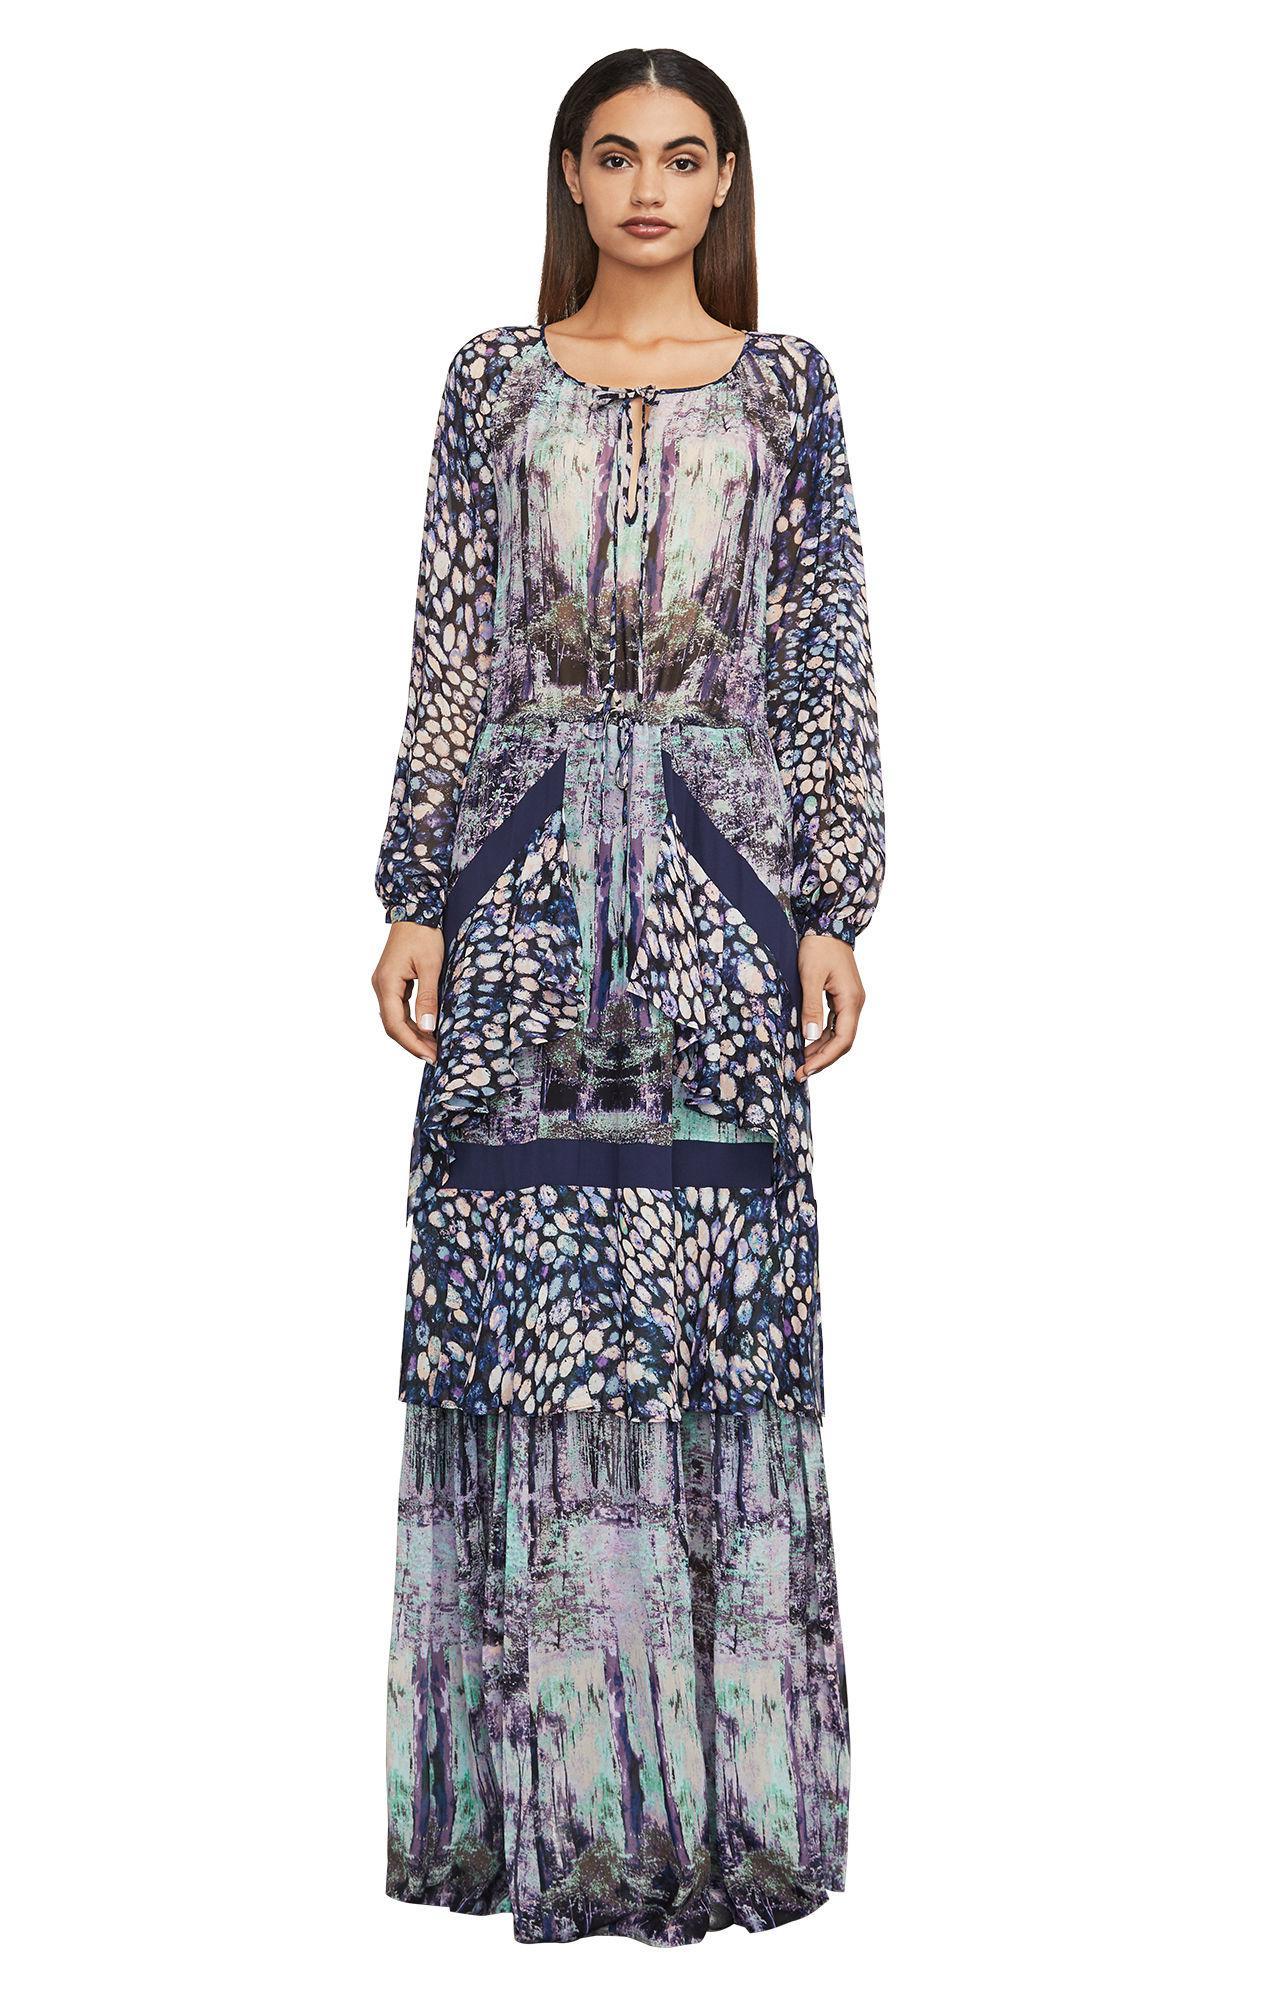 179a5b33158 Lyst - BCBGMAXAZRIA Bcbg Elisa Floral-print Maxi Dress in Blue